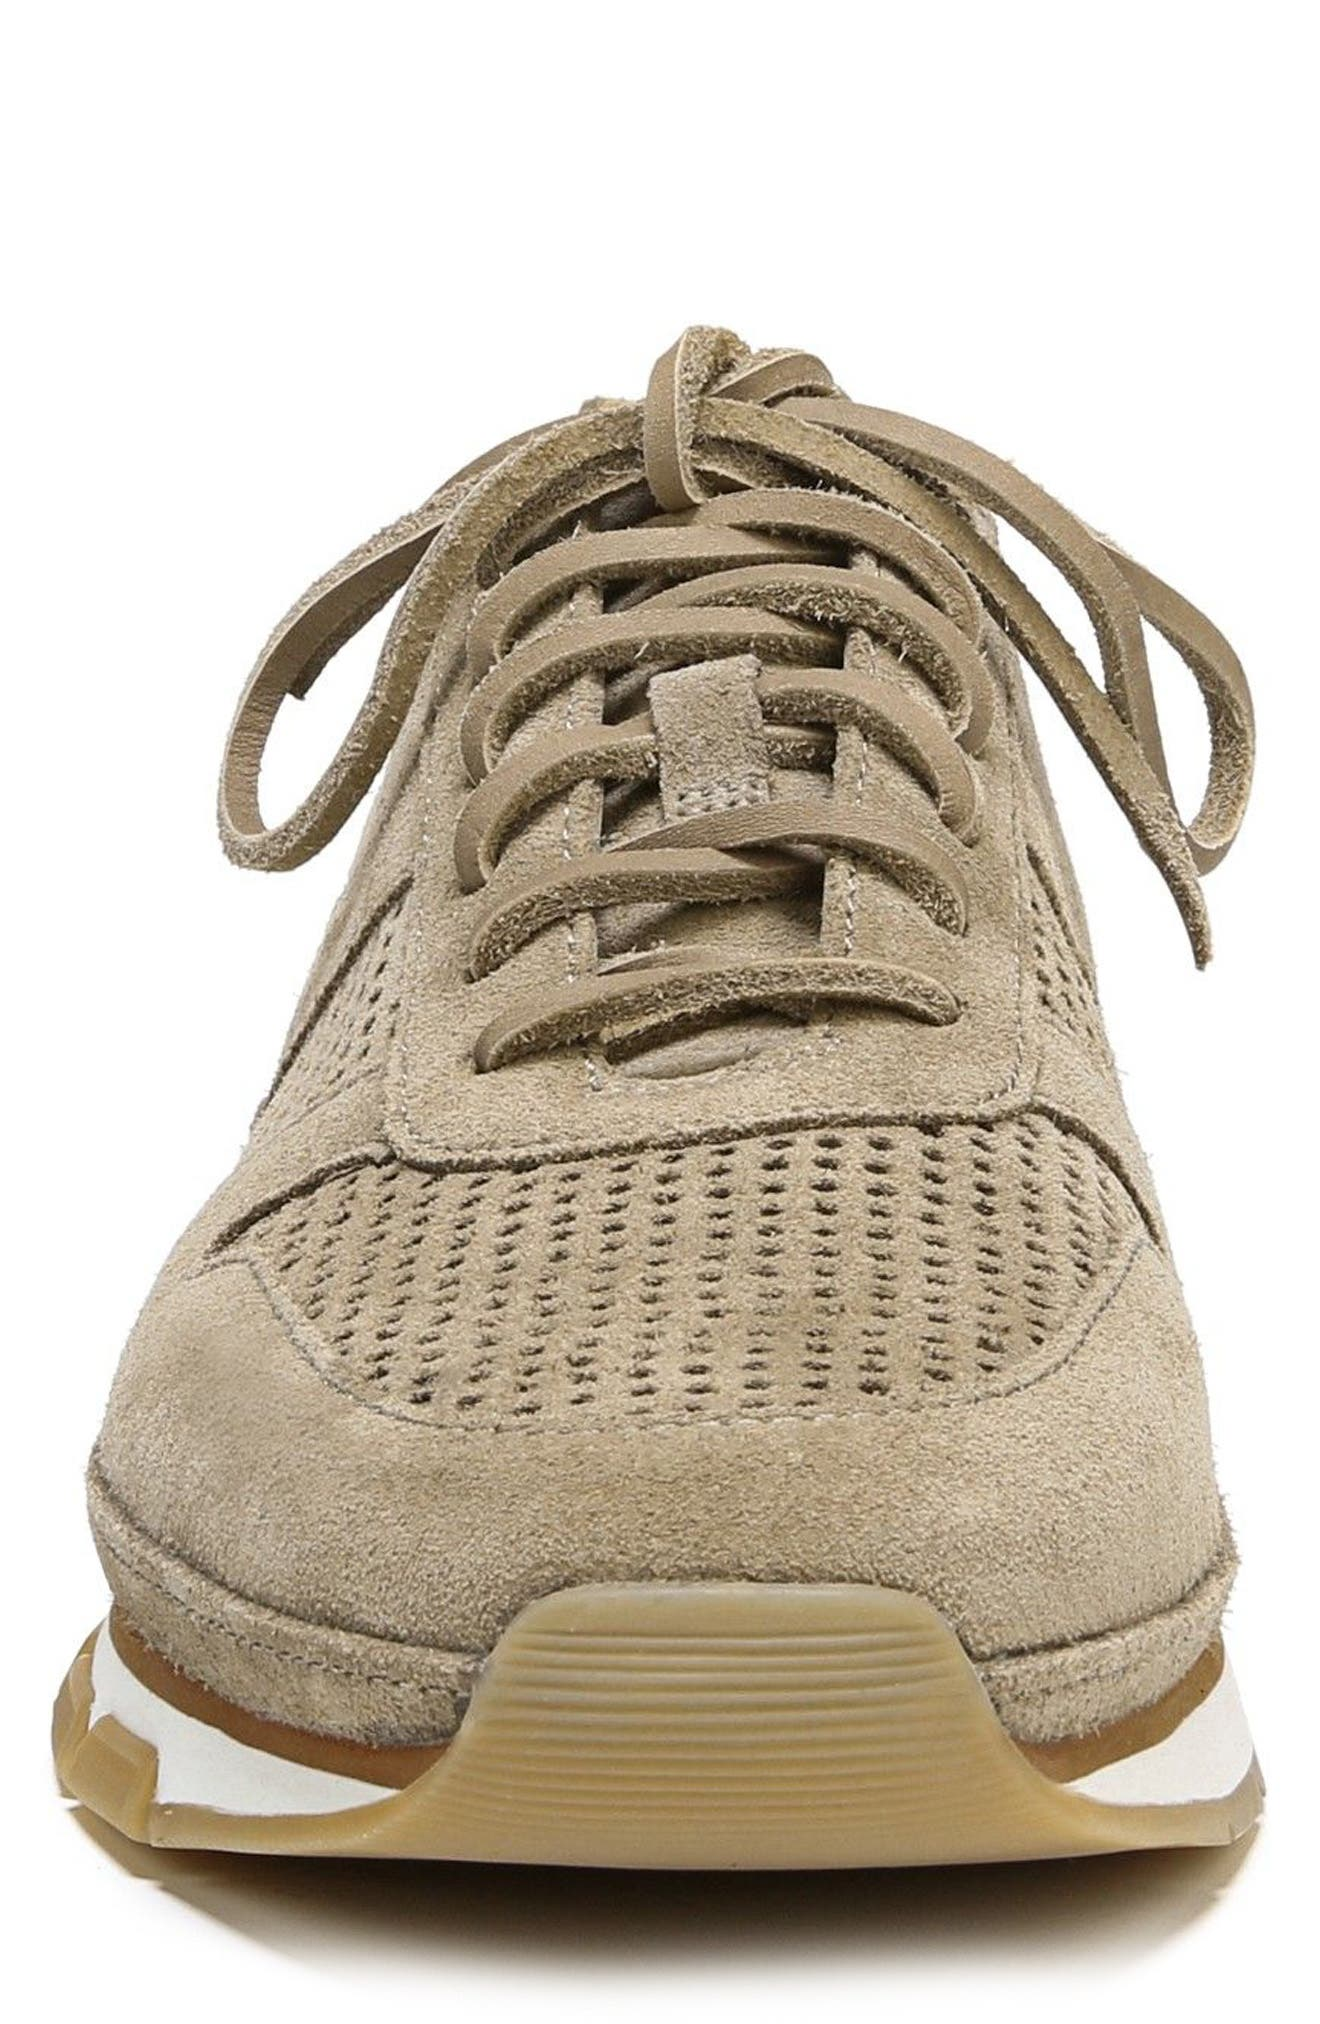 Larson Perforated Sneaker,                             Alternate thumbnail 4, color,                             250